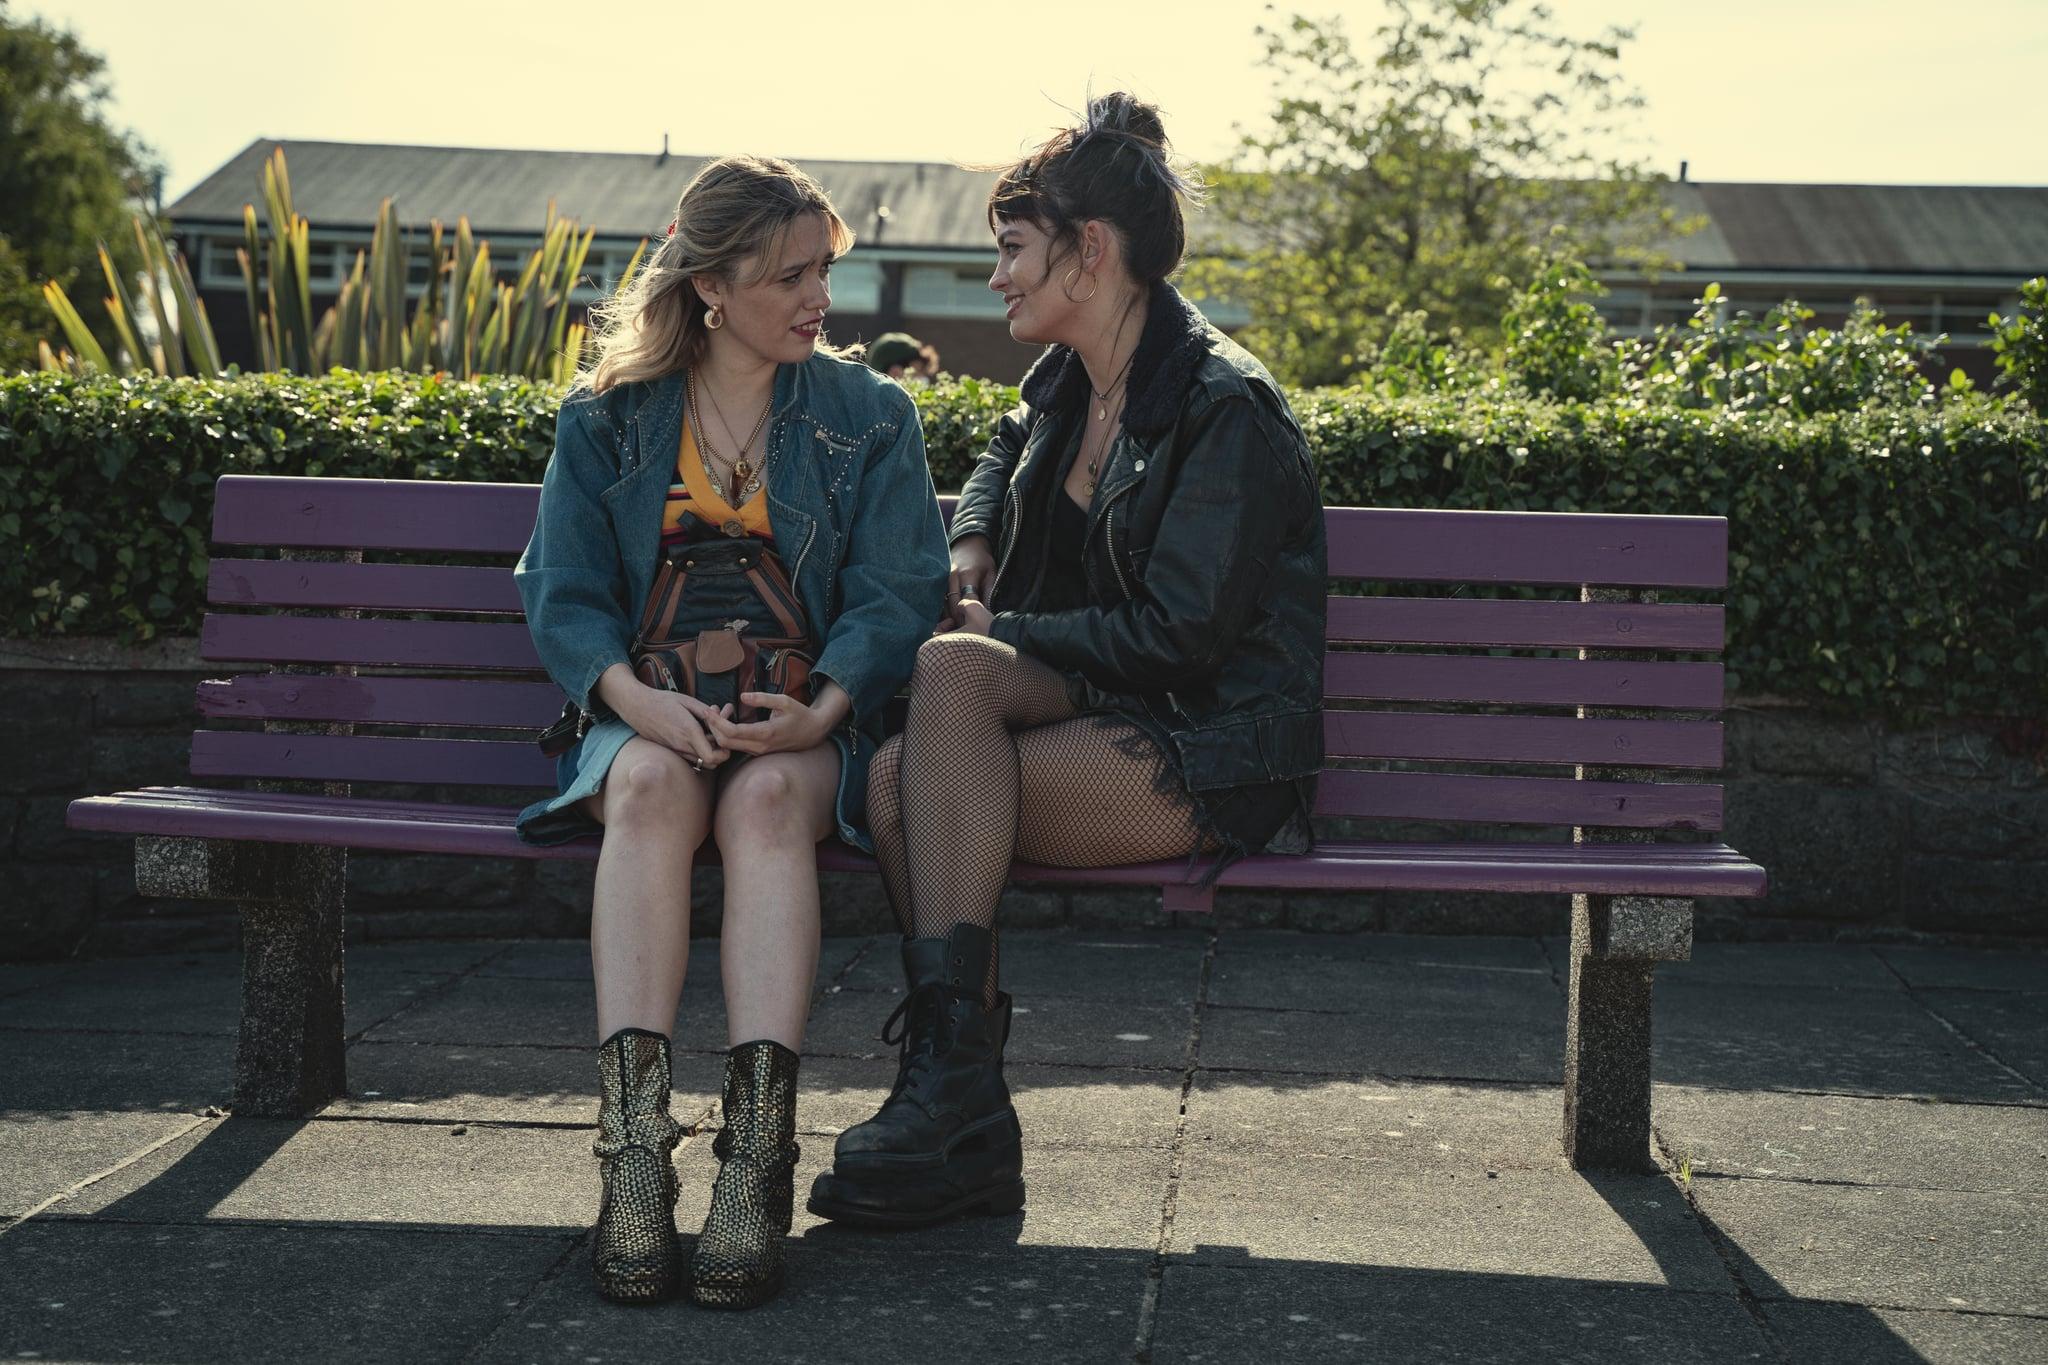 Sex Education Season 3.  Aimee Lou Wood as Aimee Gibbsin, Emma Mackey as Maeve Wiley in Episode 2 of Sex Education Season 3. Cr. Sam Taylor/NETFLIX © 2020